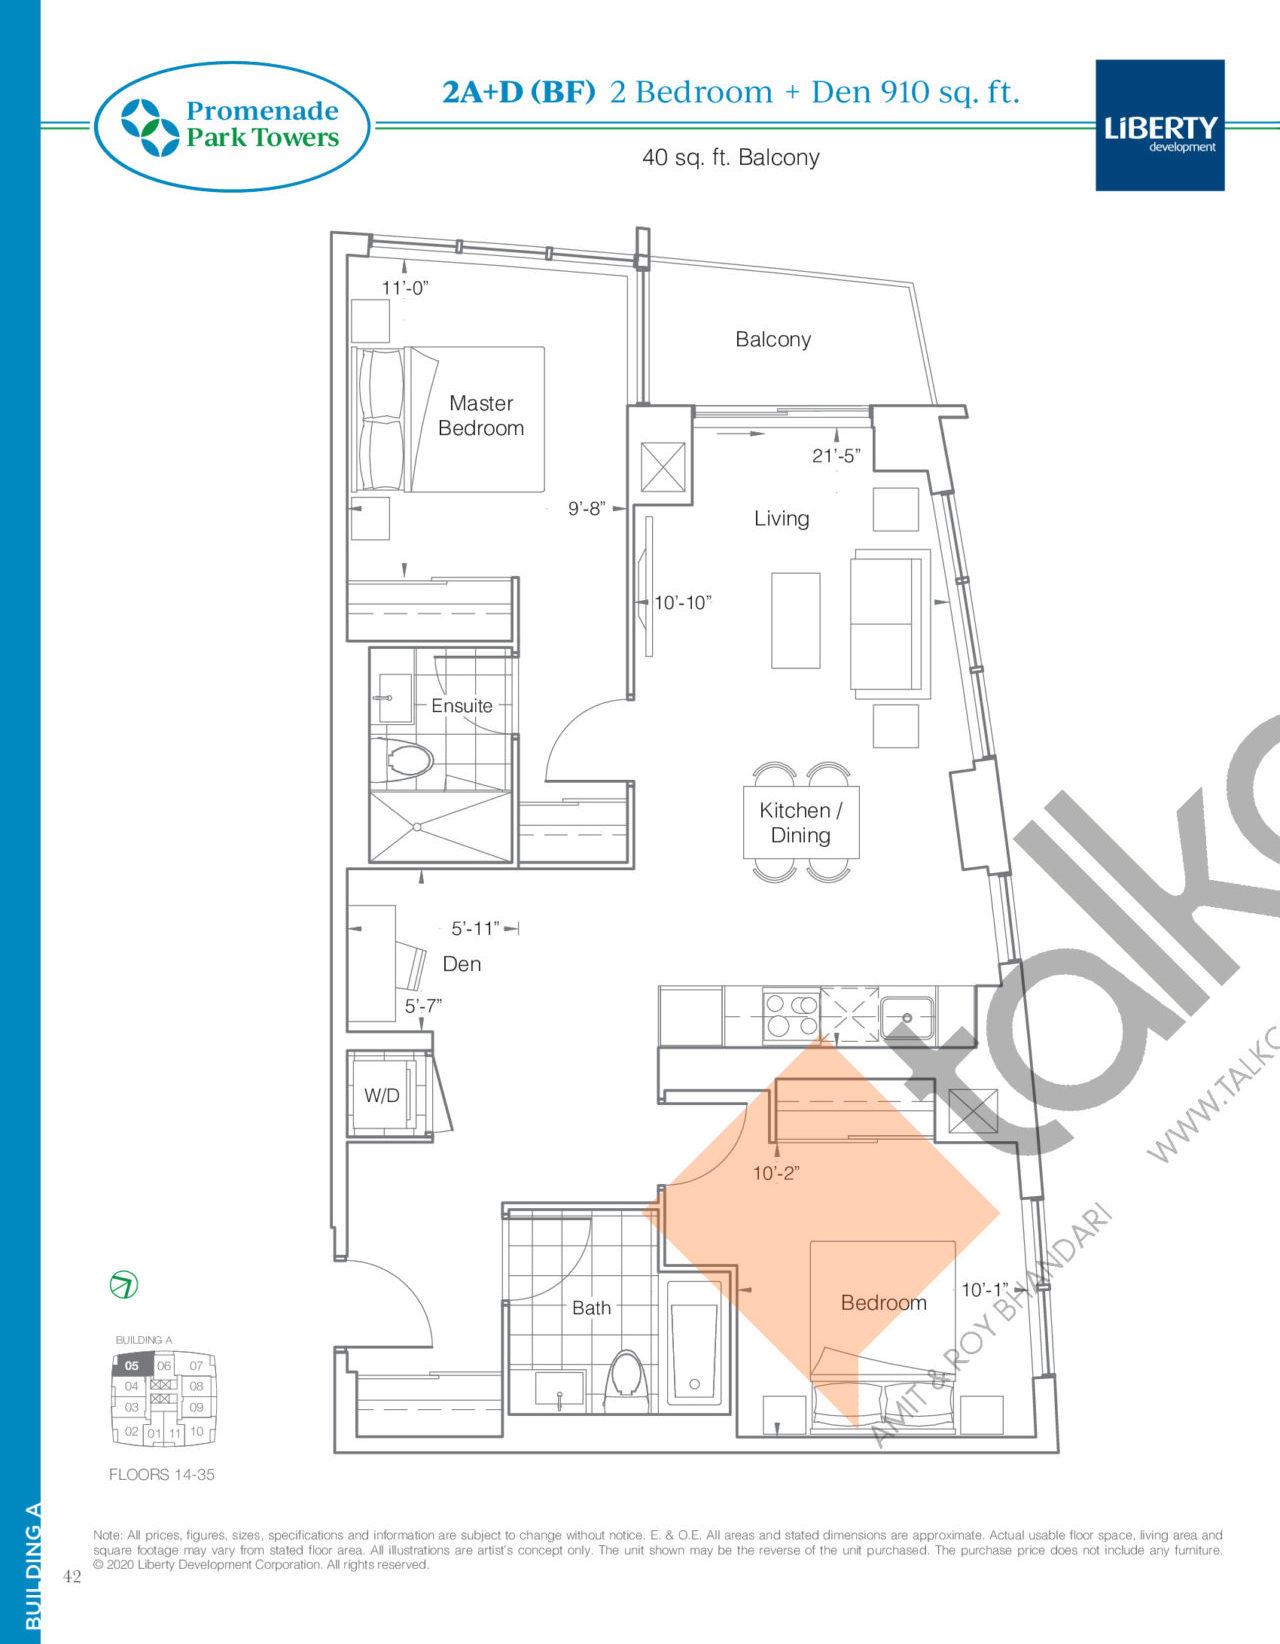 2A+D (BF) Floor Plan at Promenade Park Towers Phase 2 Condos - 910 sq.ft